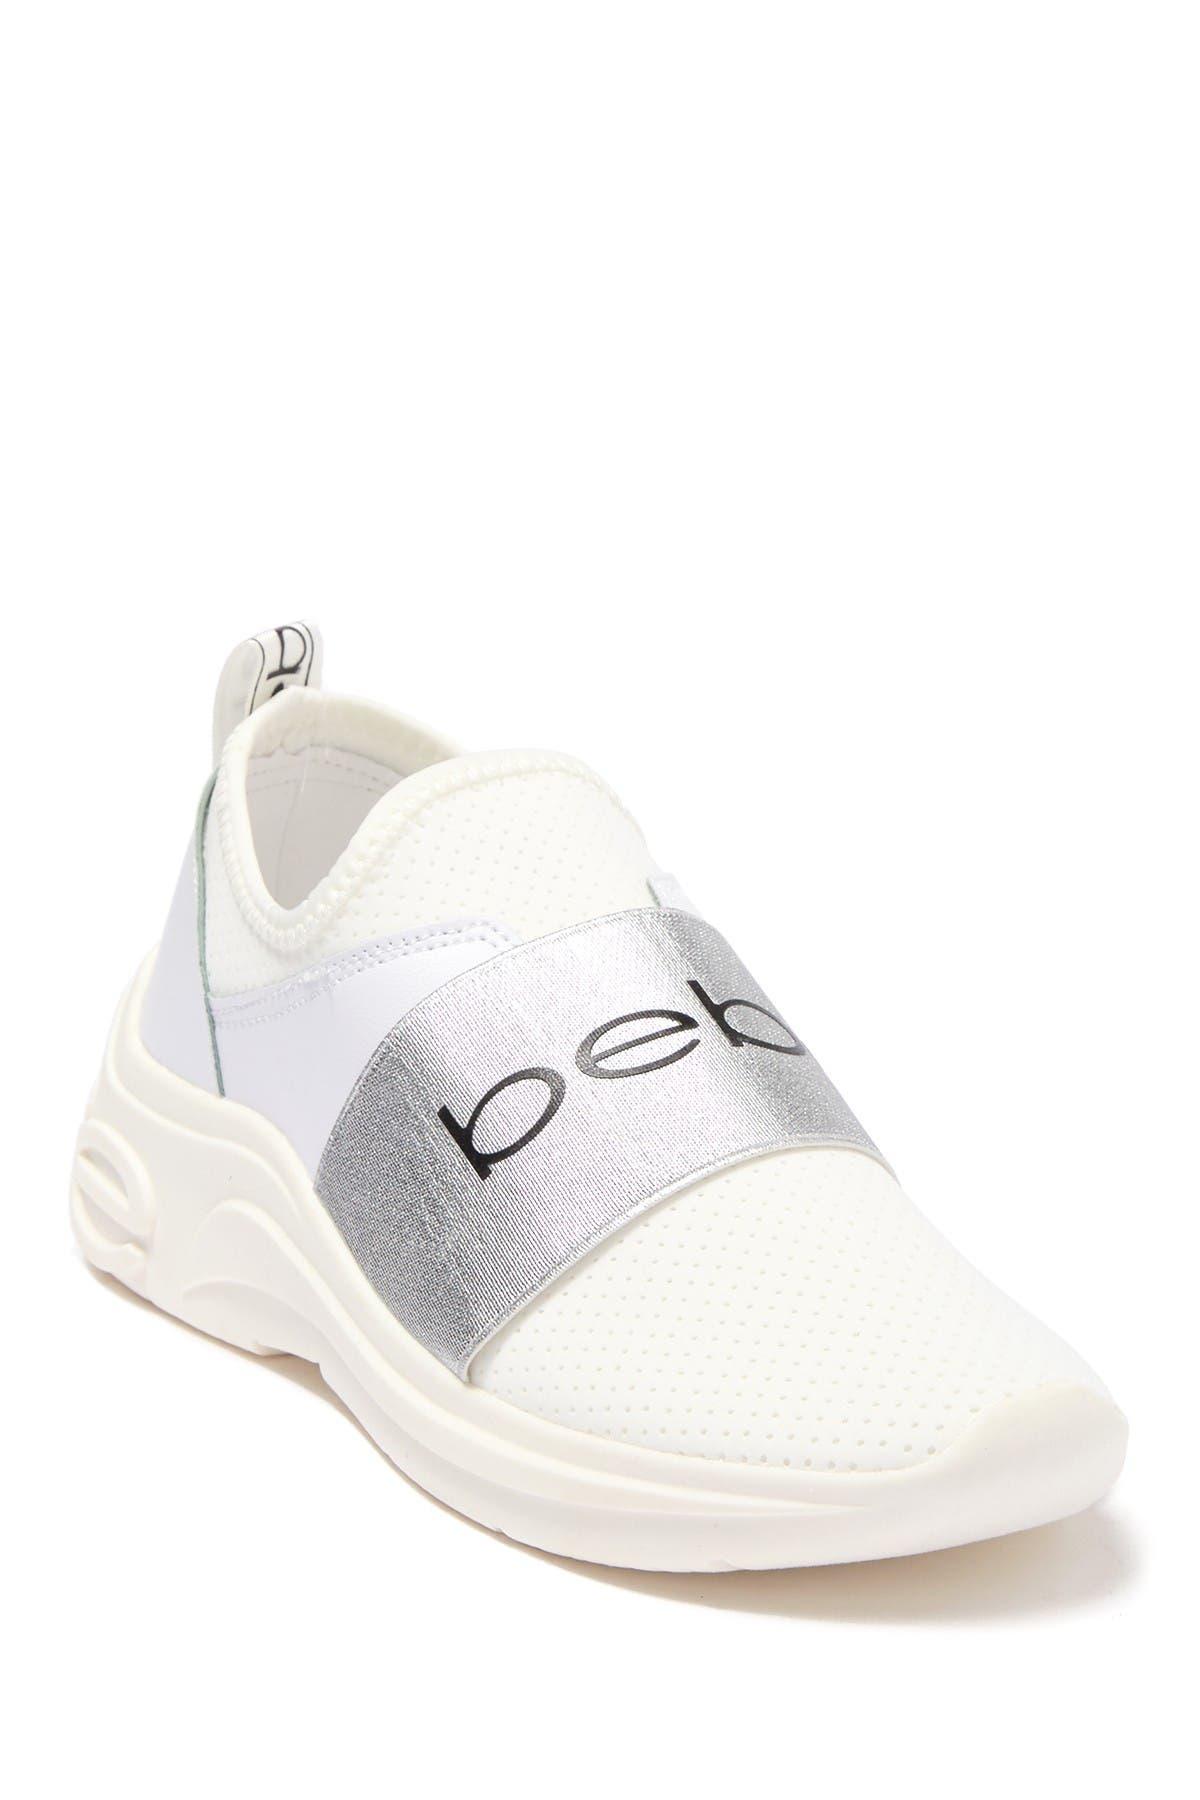 bebe | Ladd Slip-On Sneaker | Nordstrom